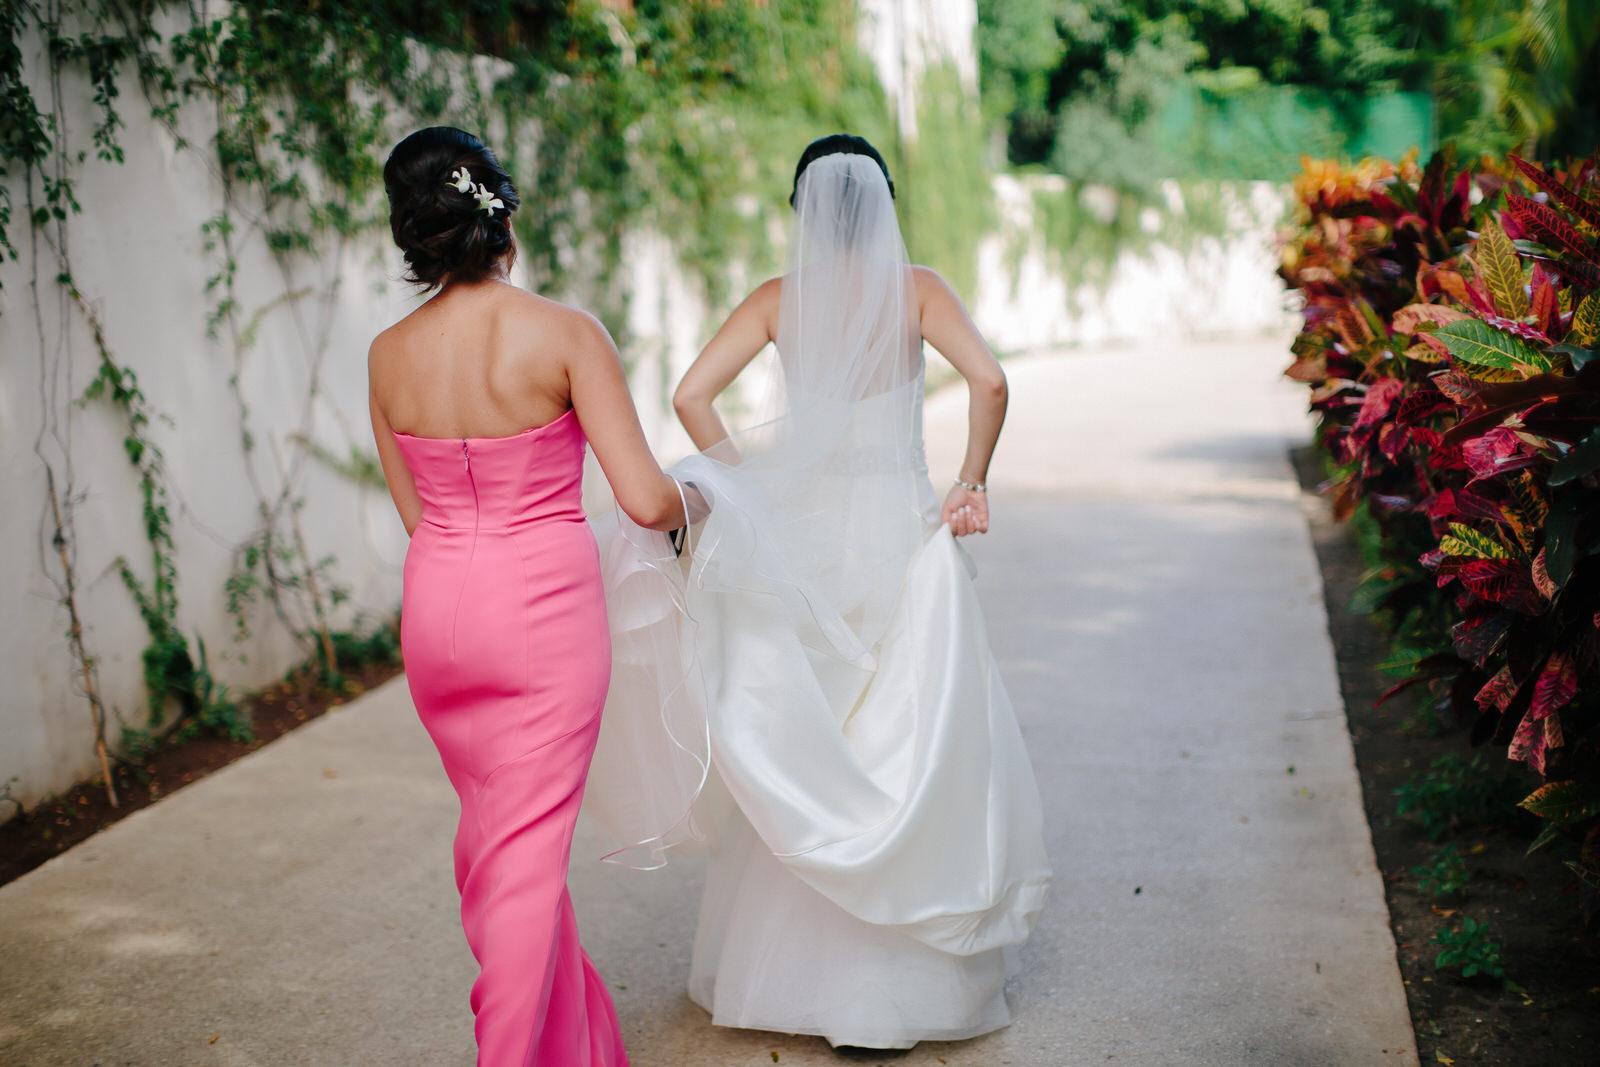 playa-del-carmen-wedding-moments-2.jpg